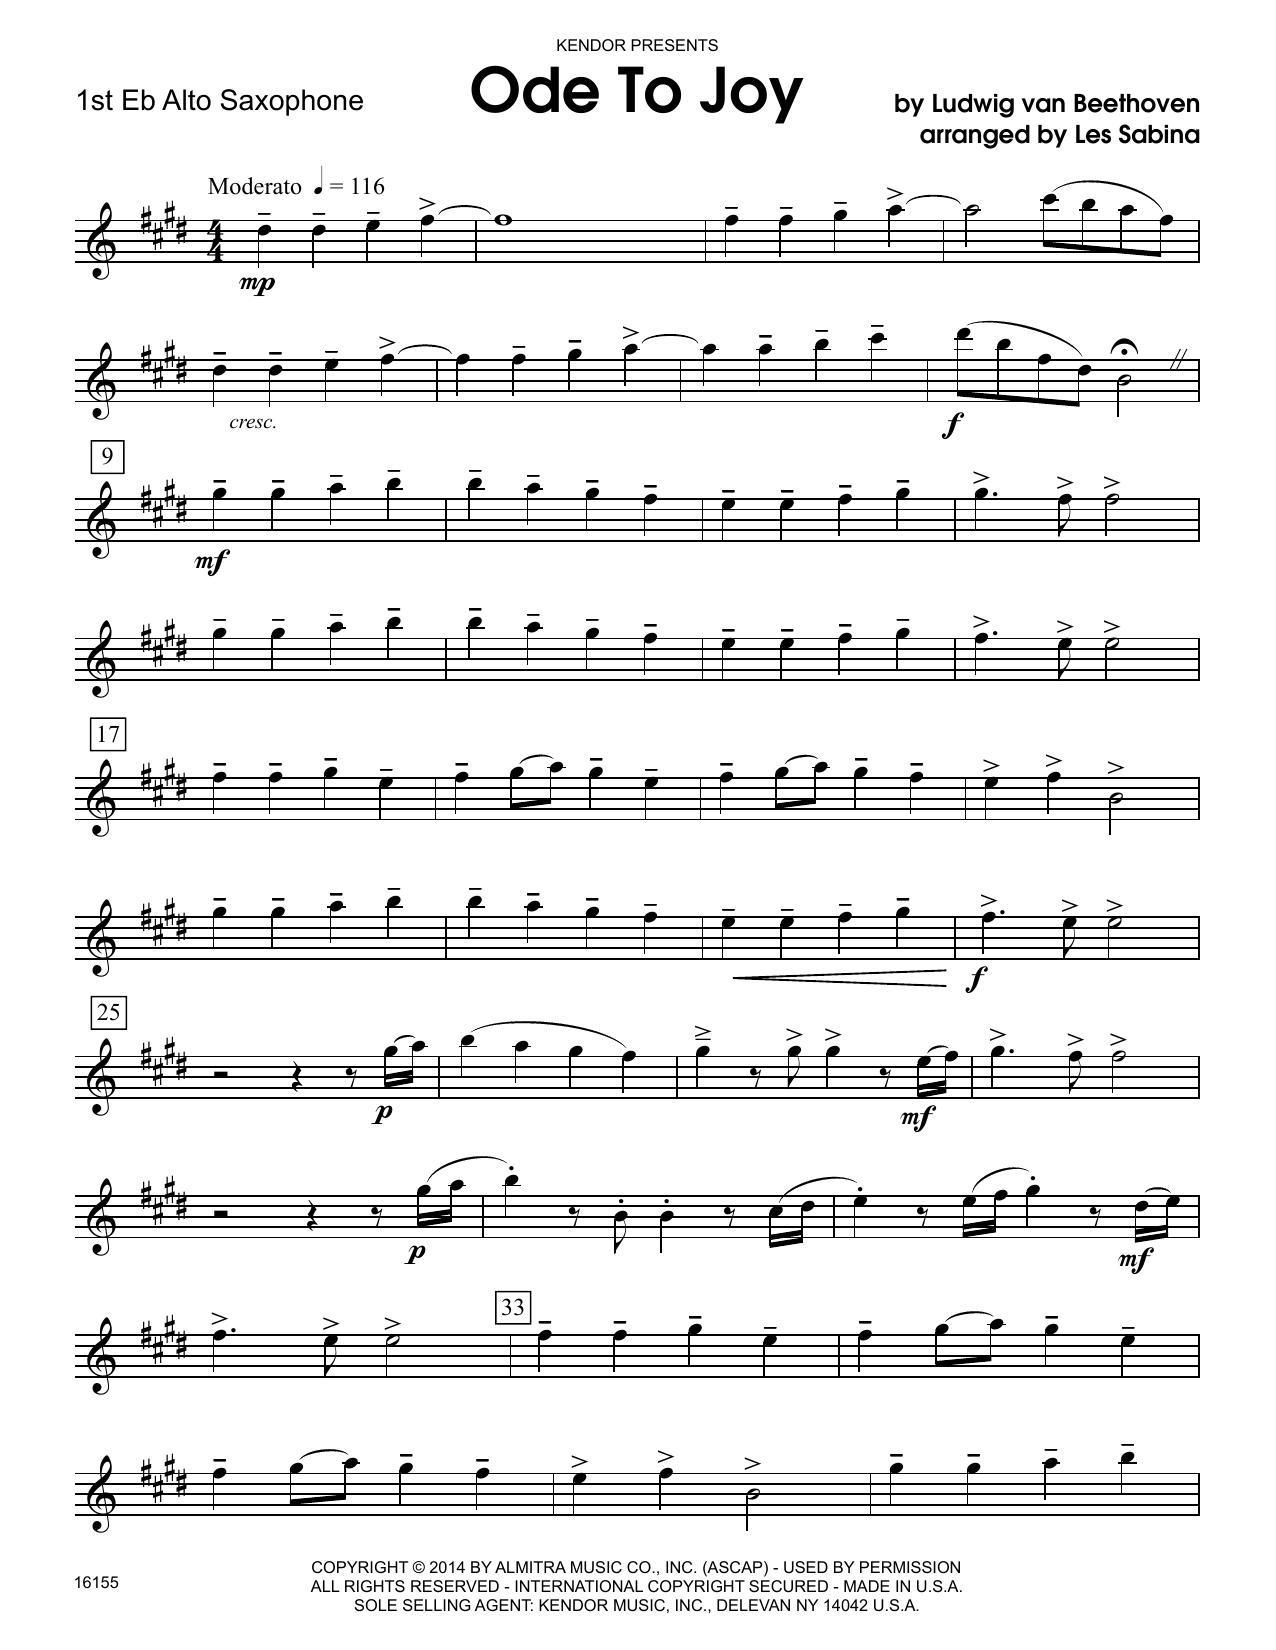 Ode To Joy - 1st Eb Alto Saxophone Sheet Music